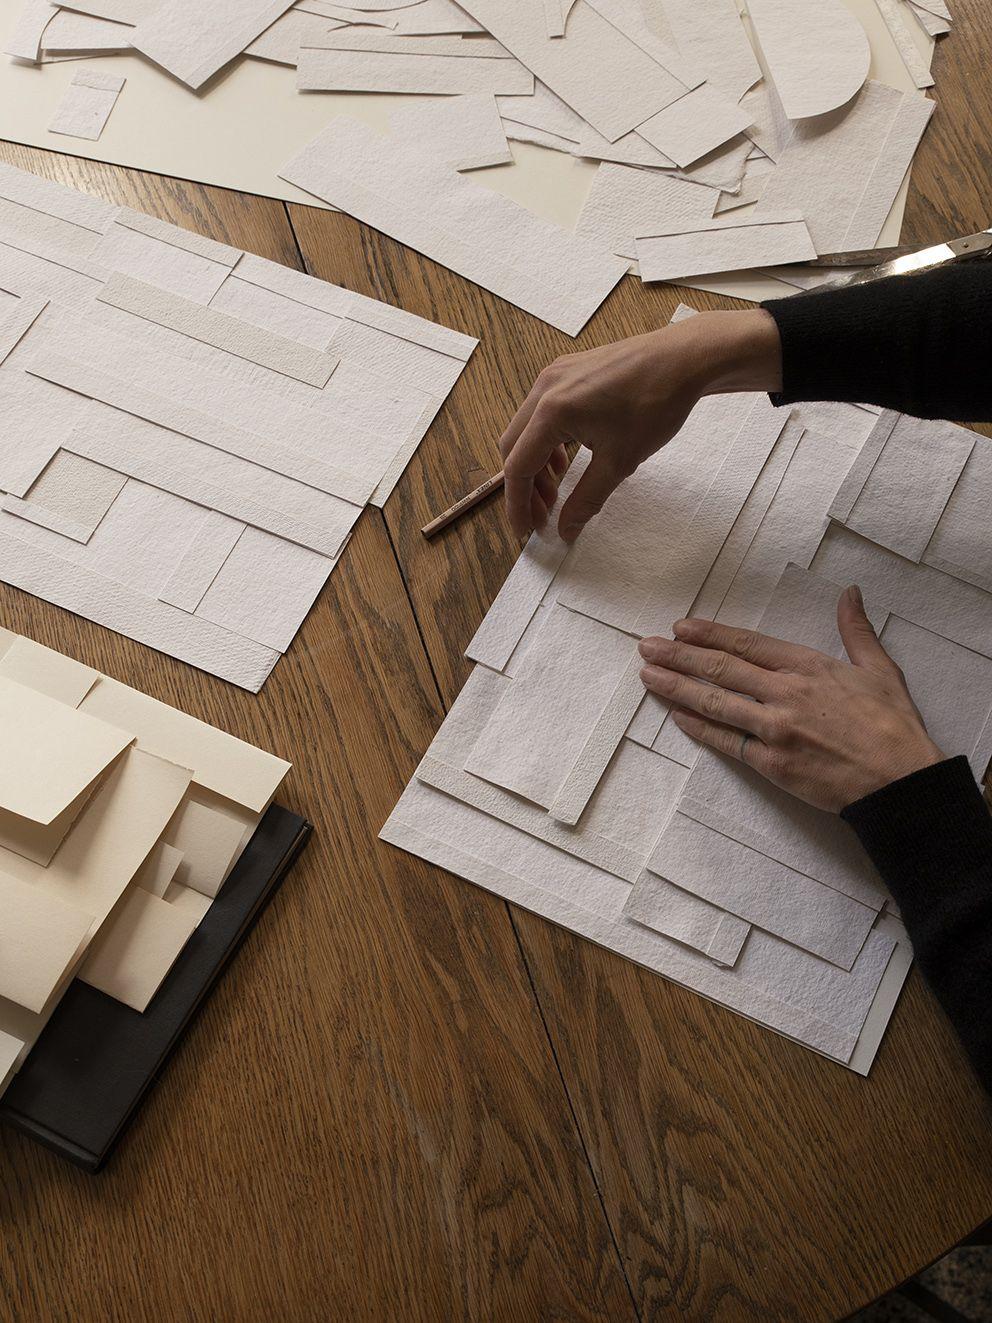 Blank 02 - Original artwork by the design studio Atelier CPH